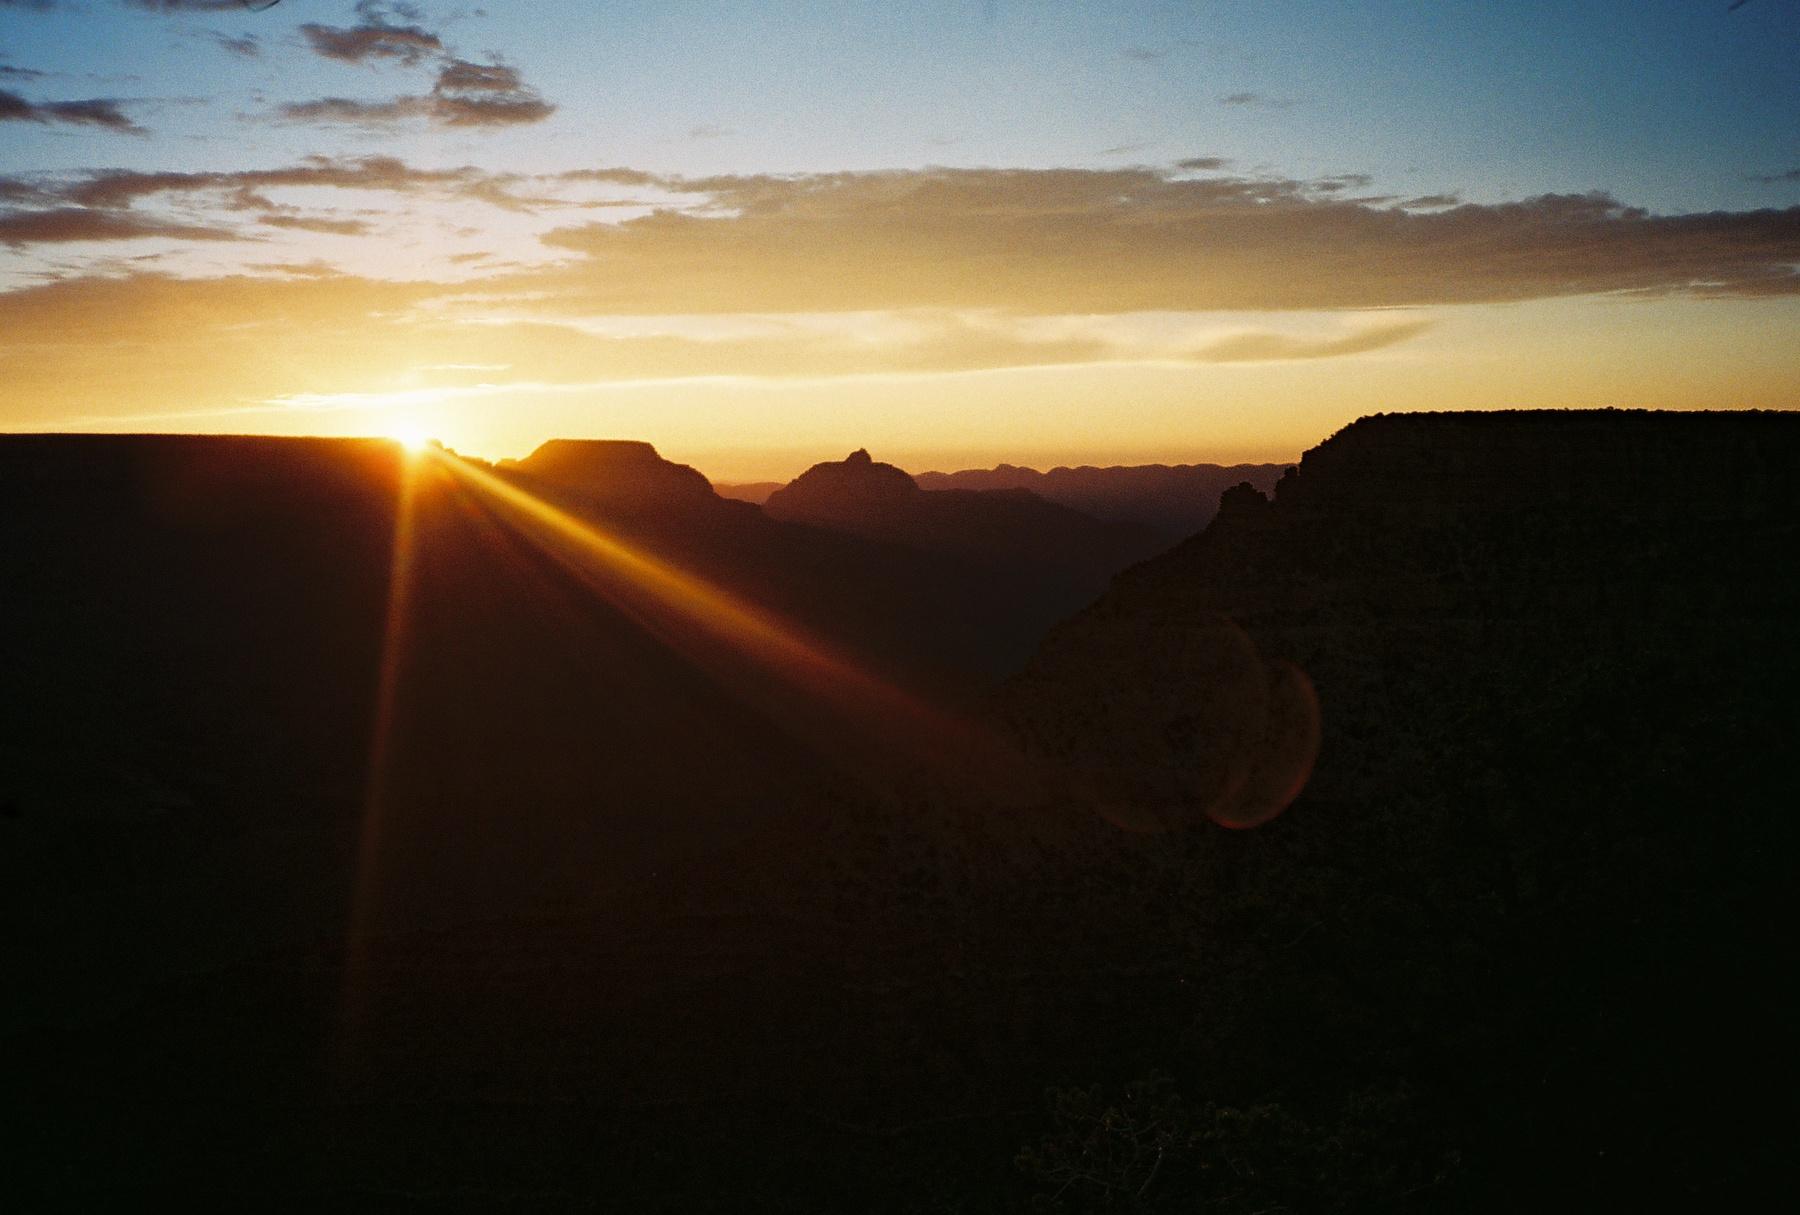 Grand Canyon, Arizona - Danny